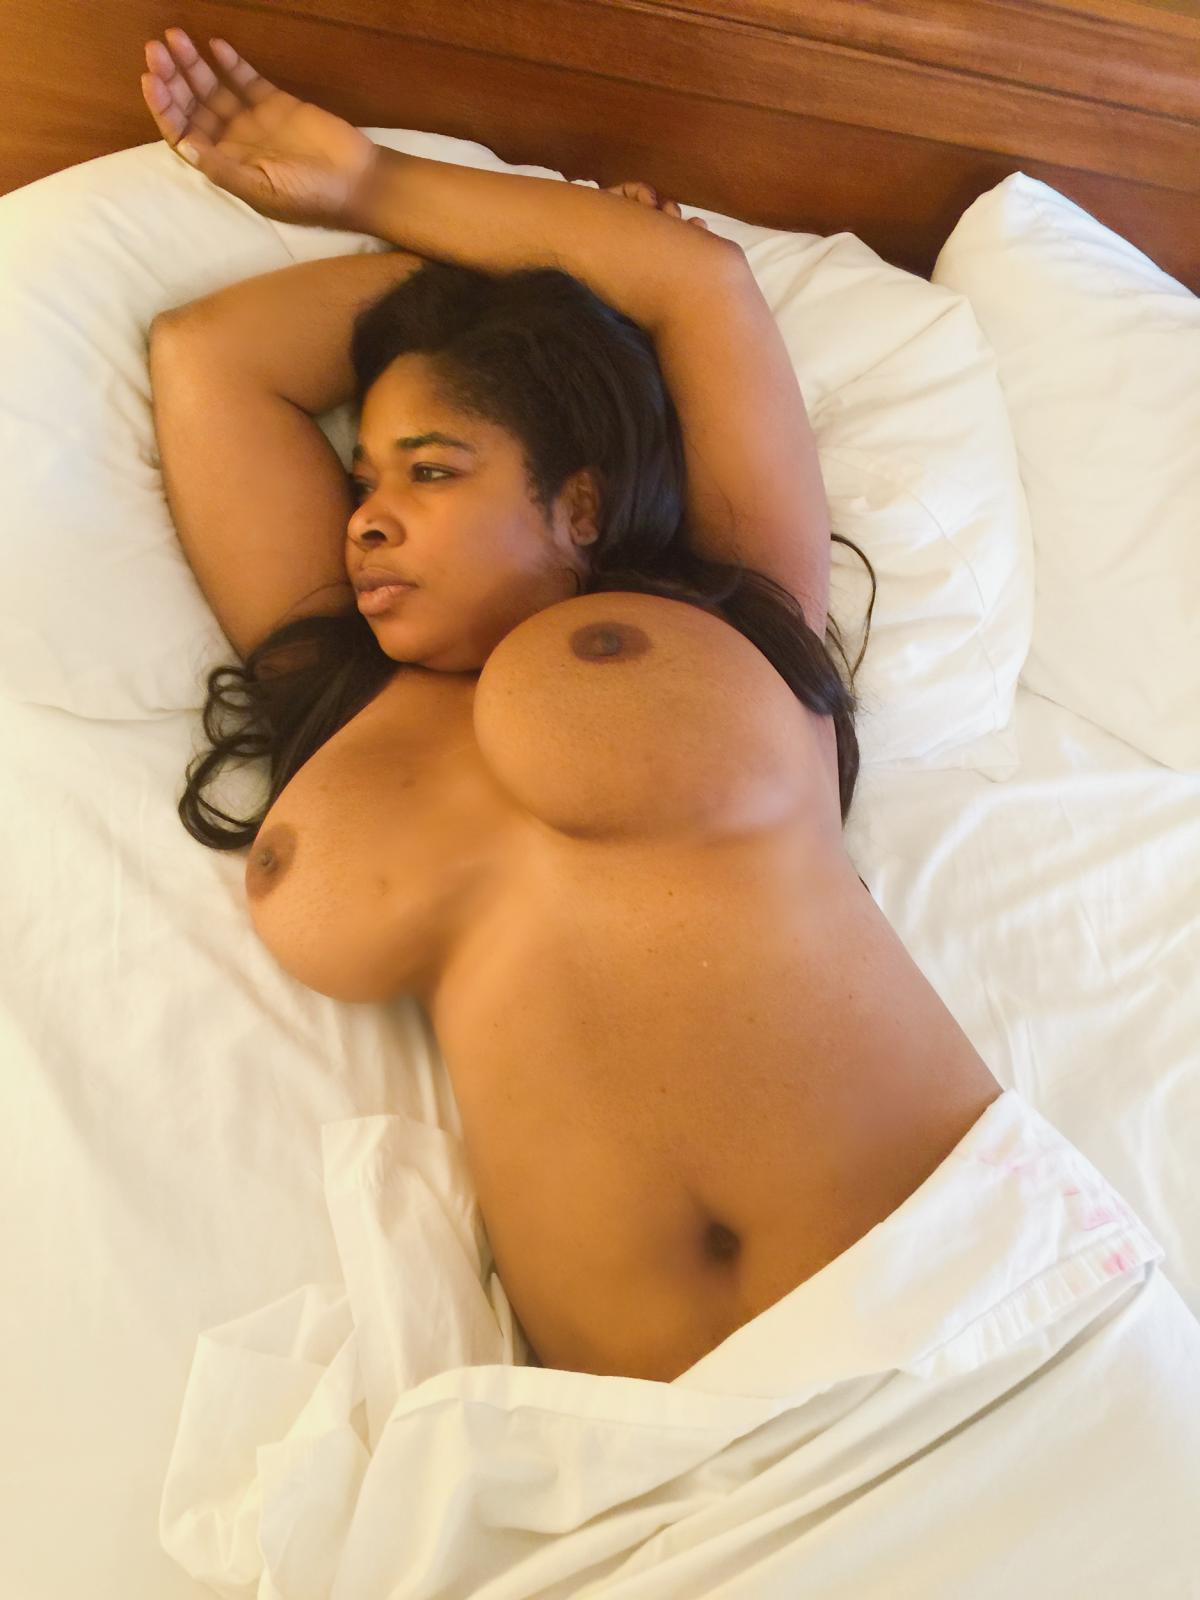 A nigerian lady fully naked